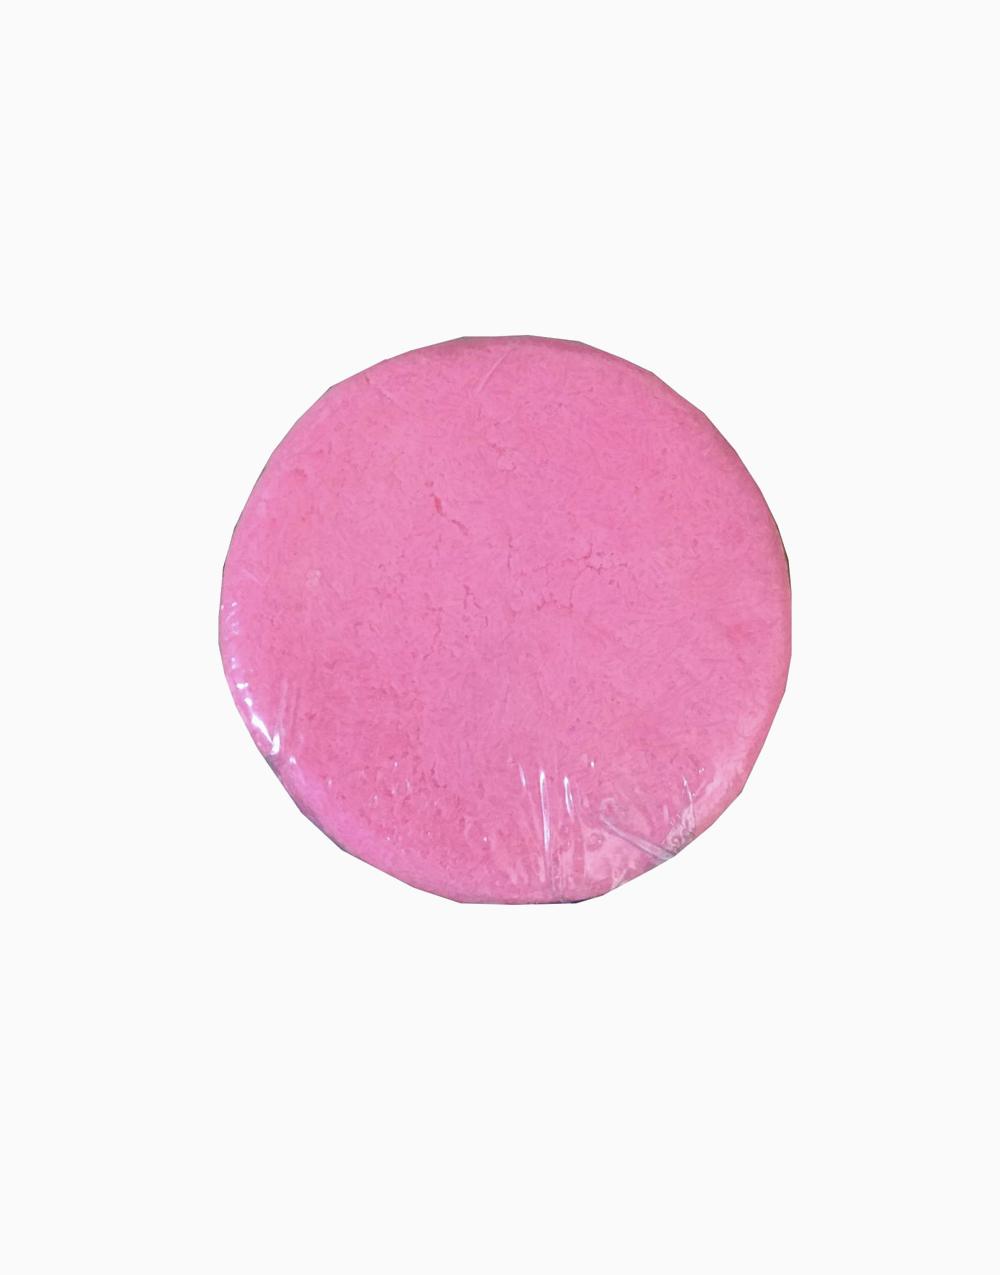 VCO Lavender Shampoo Bar by Next2Nature